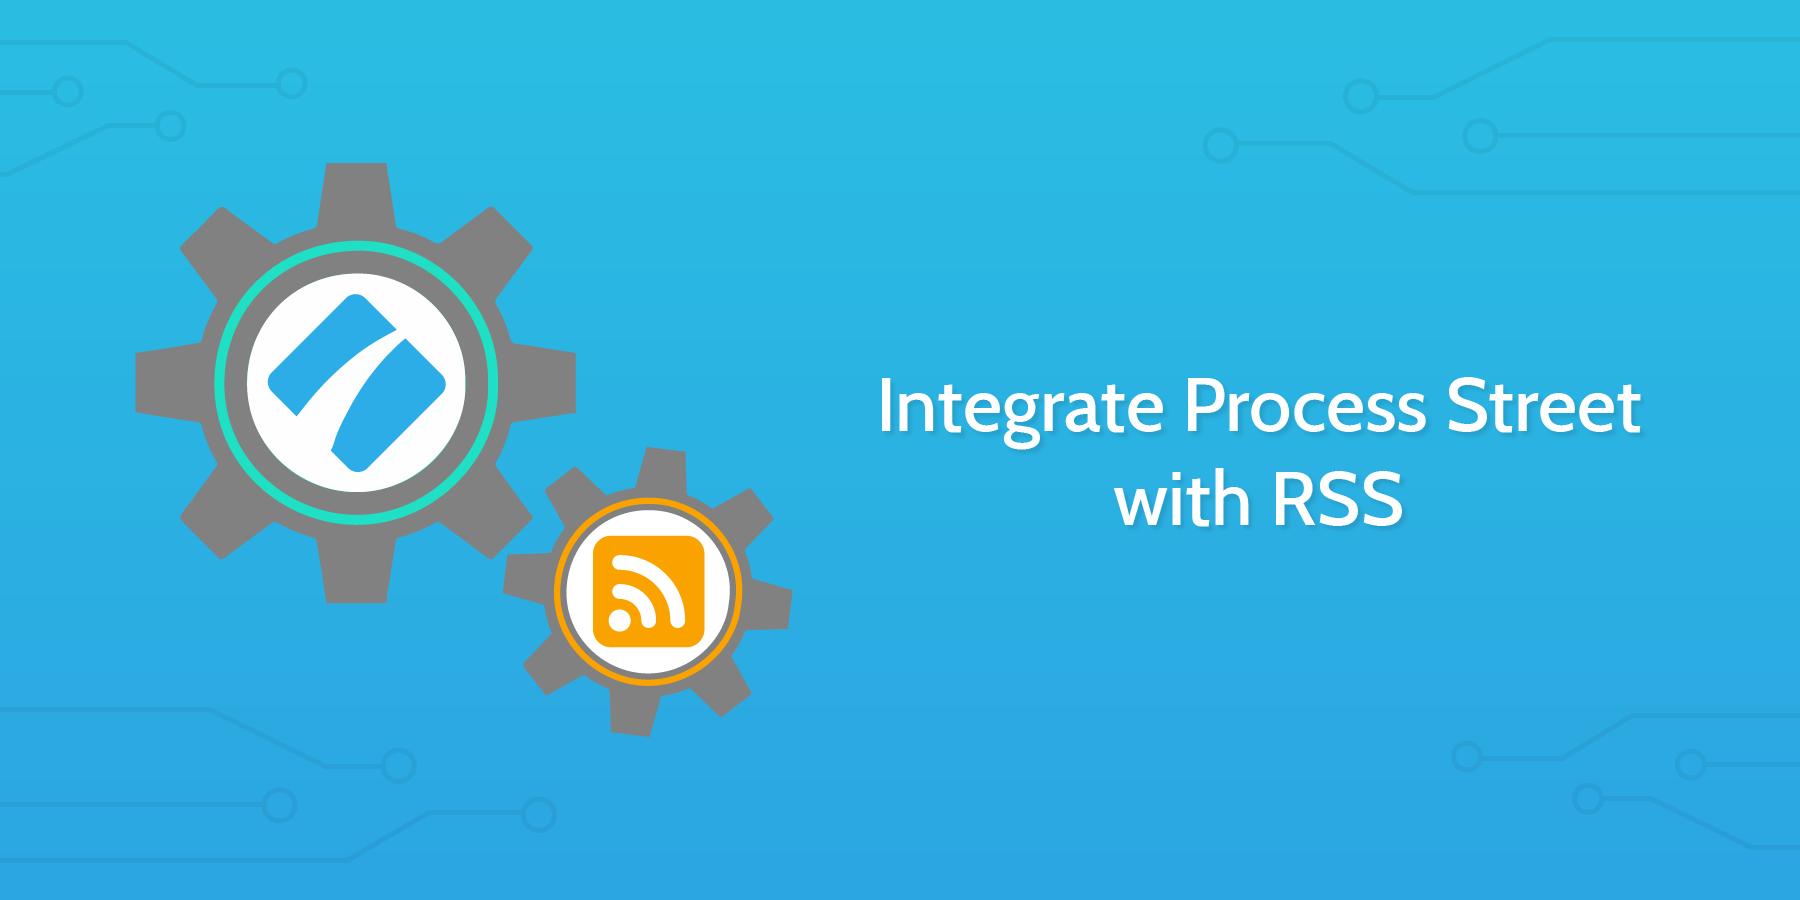 rss-process-street-integration